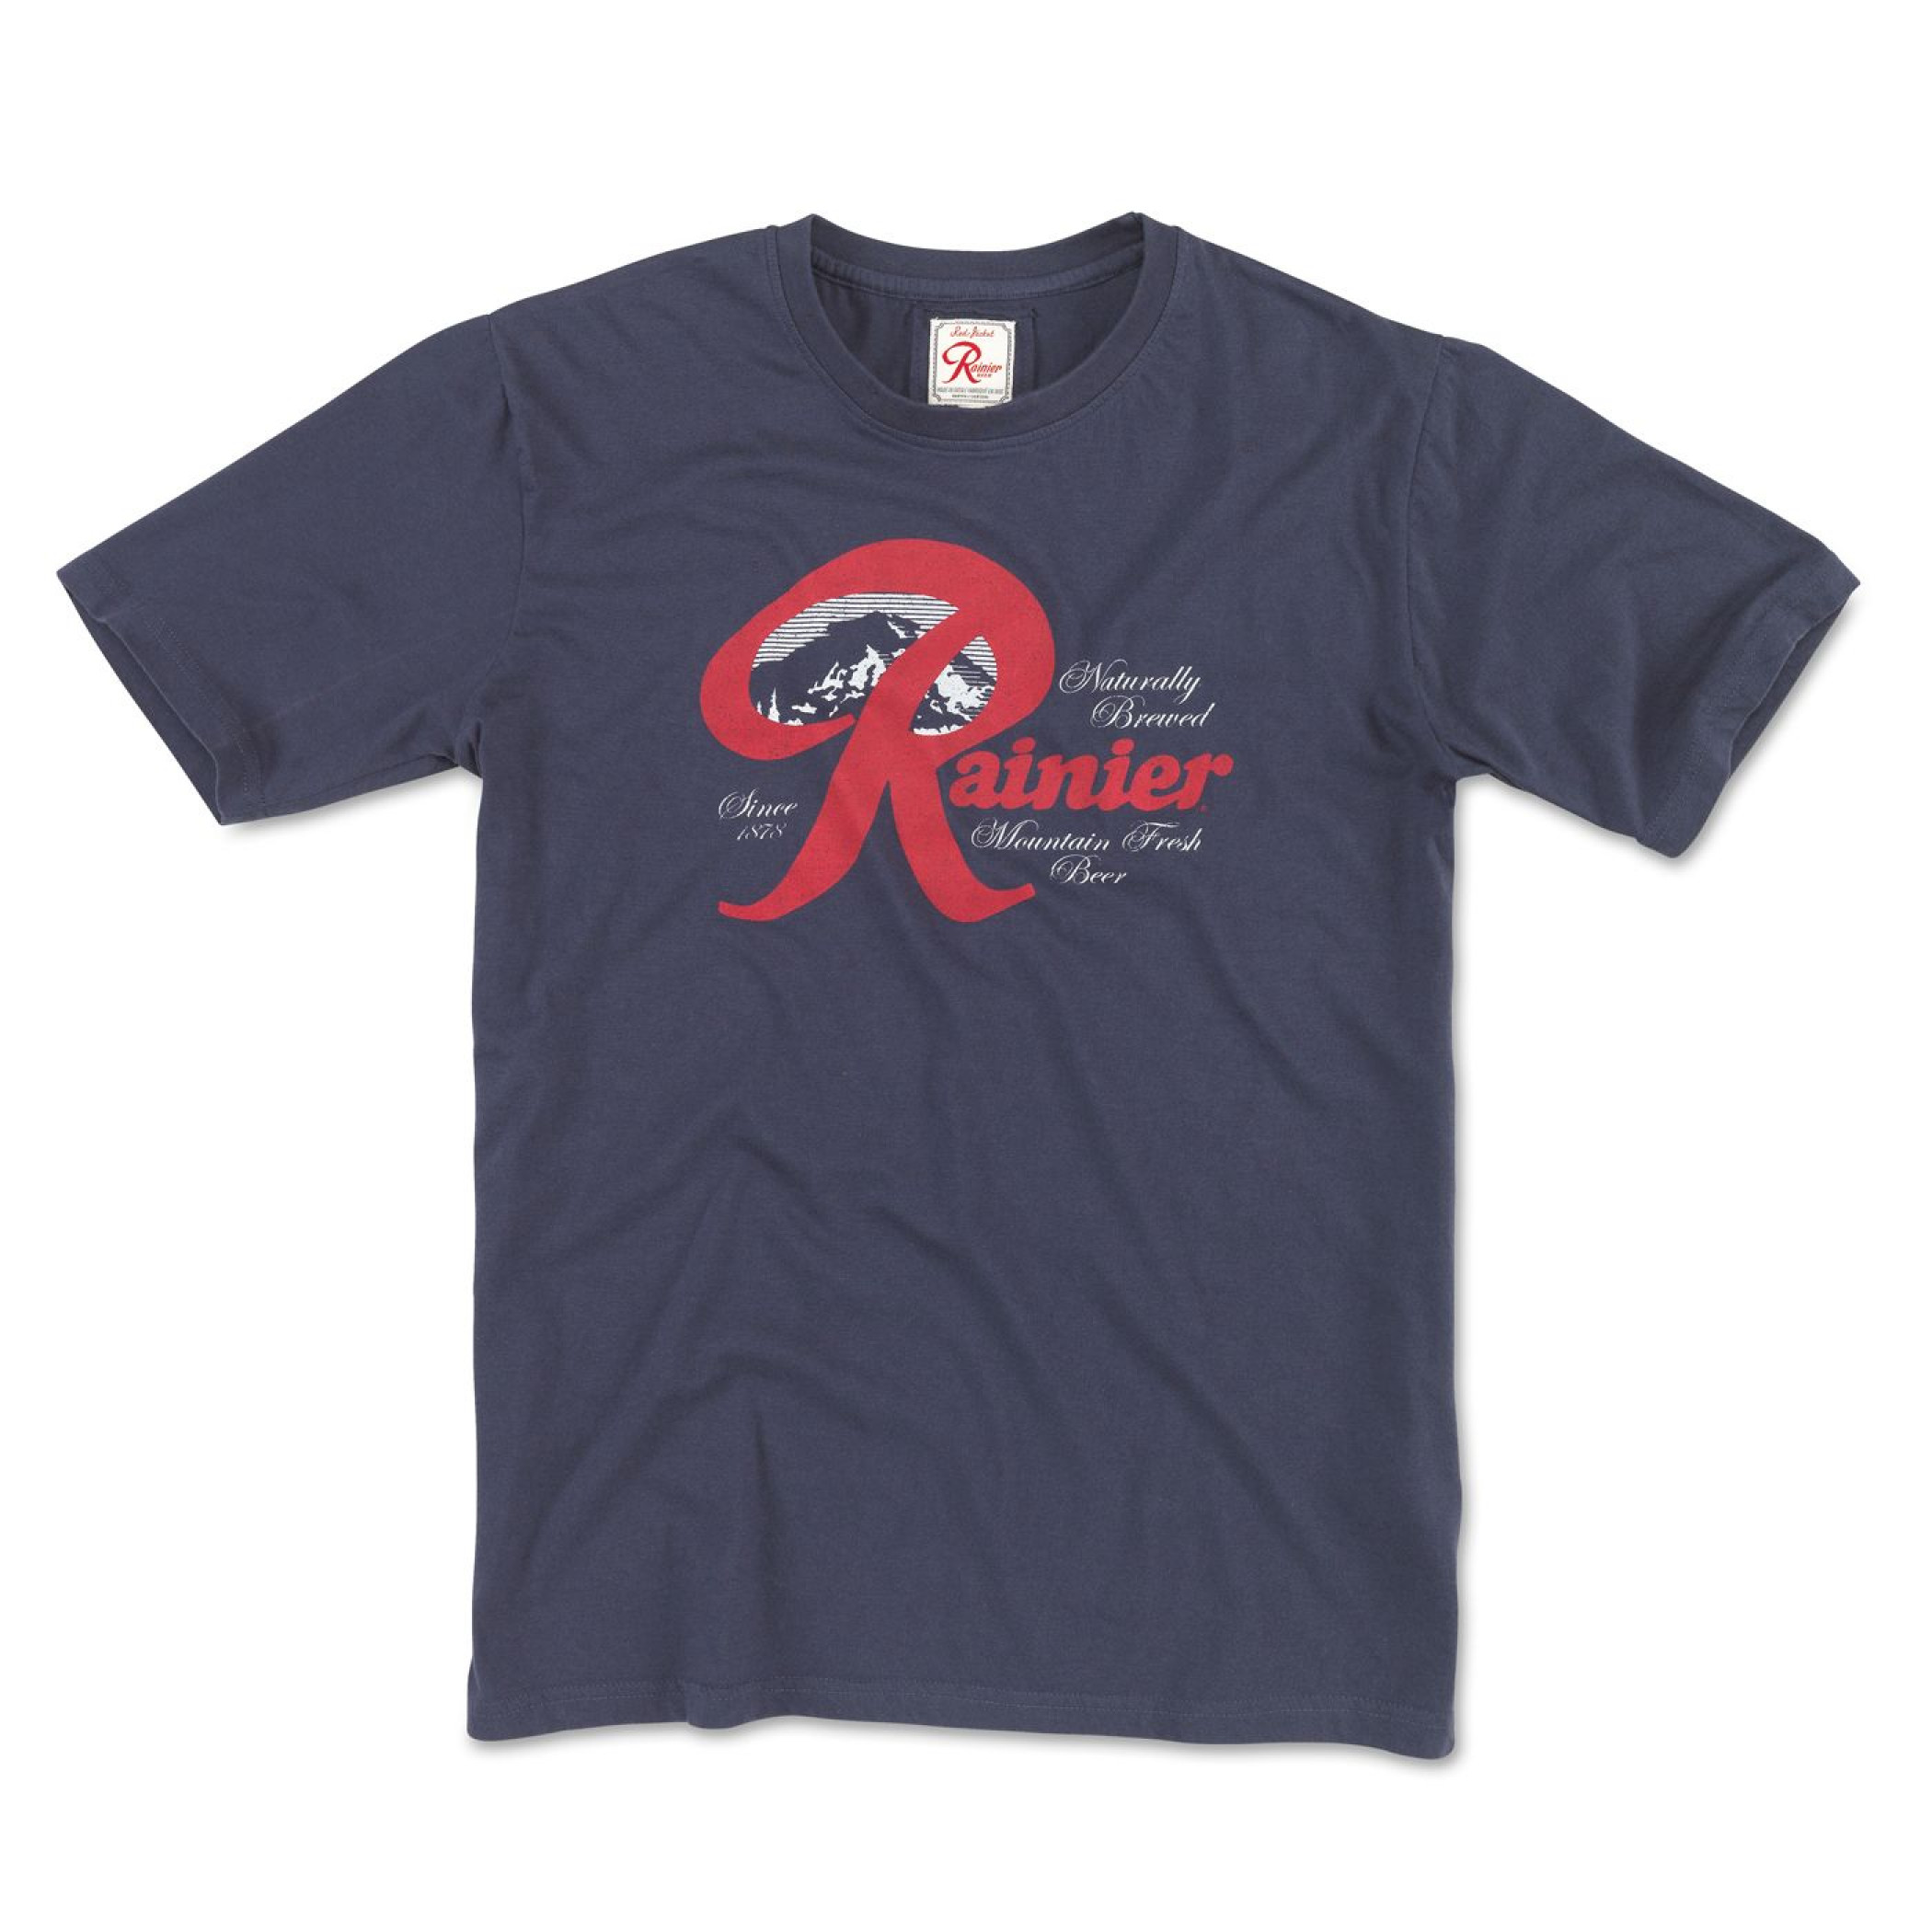 Rainier Naturally Brewed Classic Logo T-Shirt